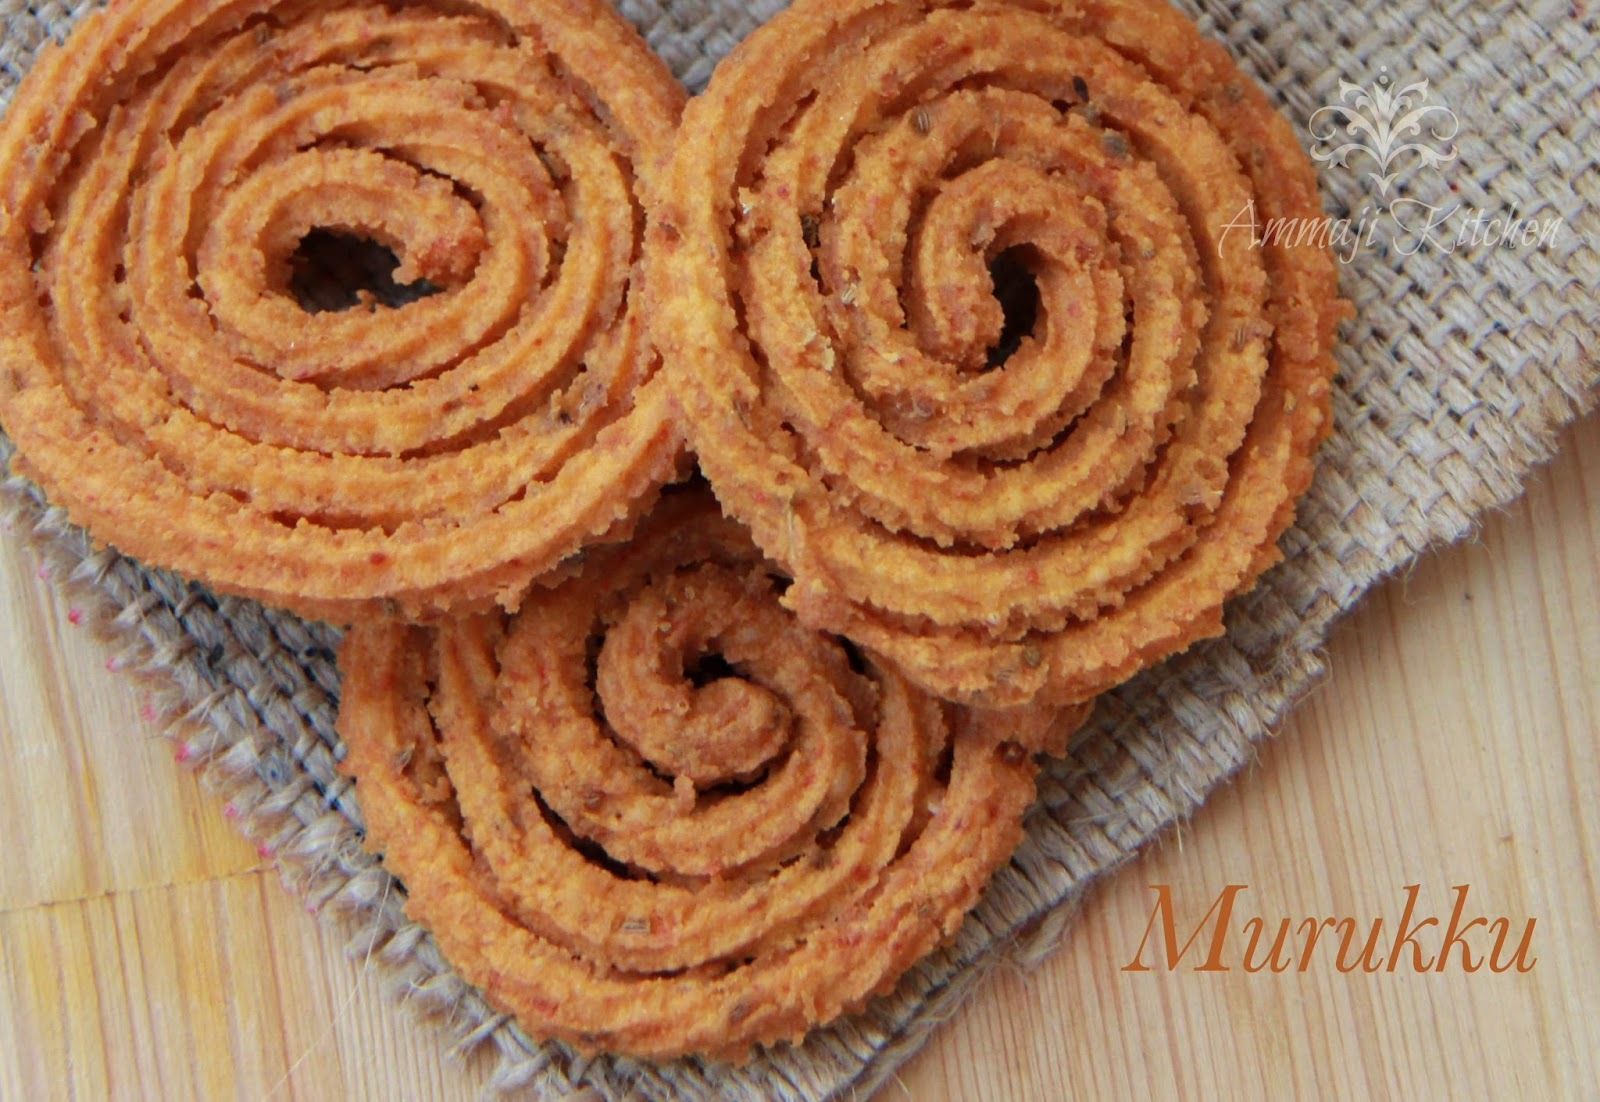 Murukulu | Crispy Murukku | Chakli | How to make Murukku?